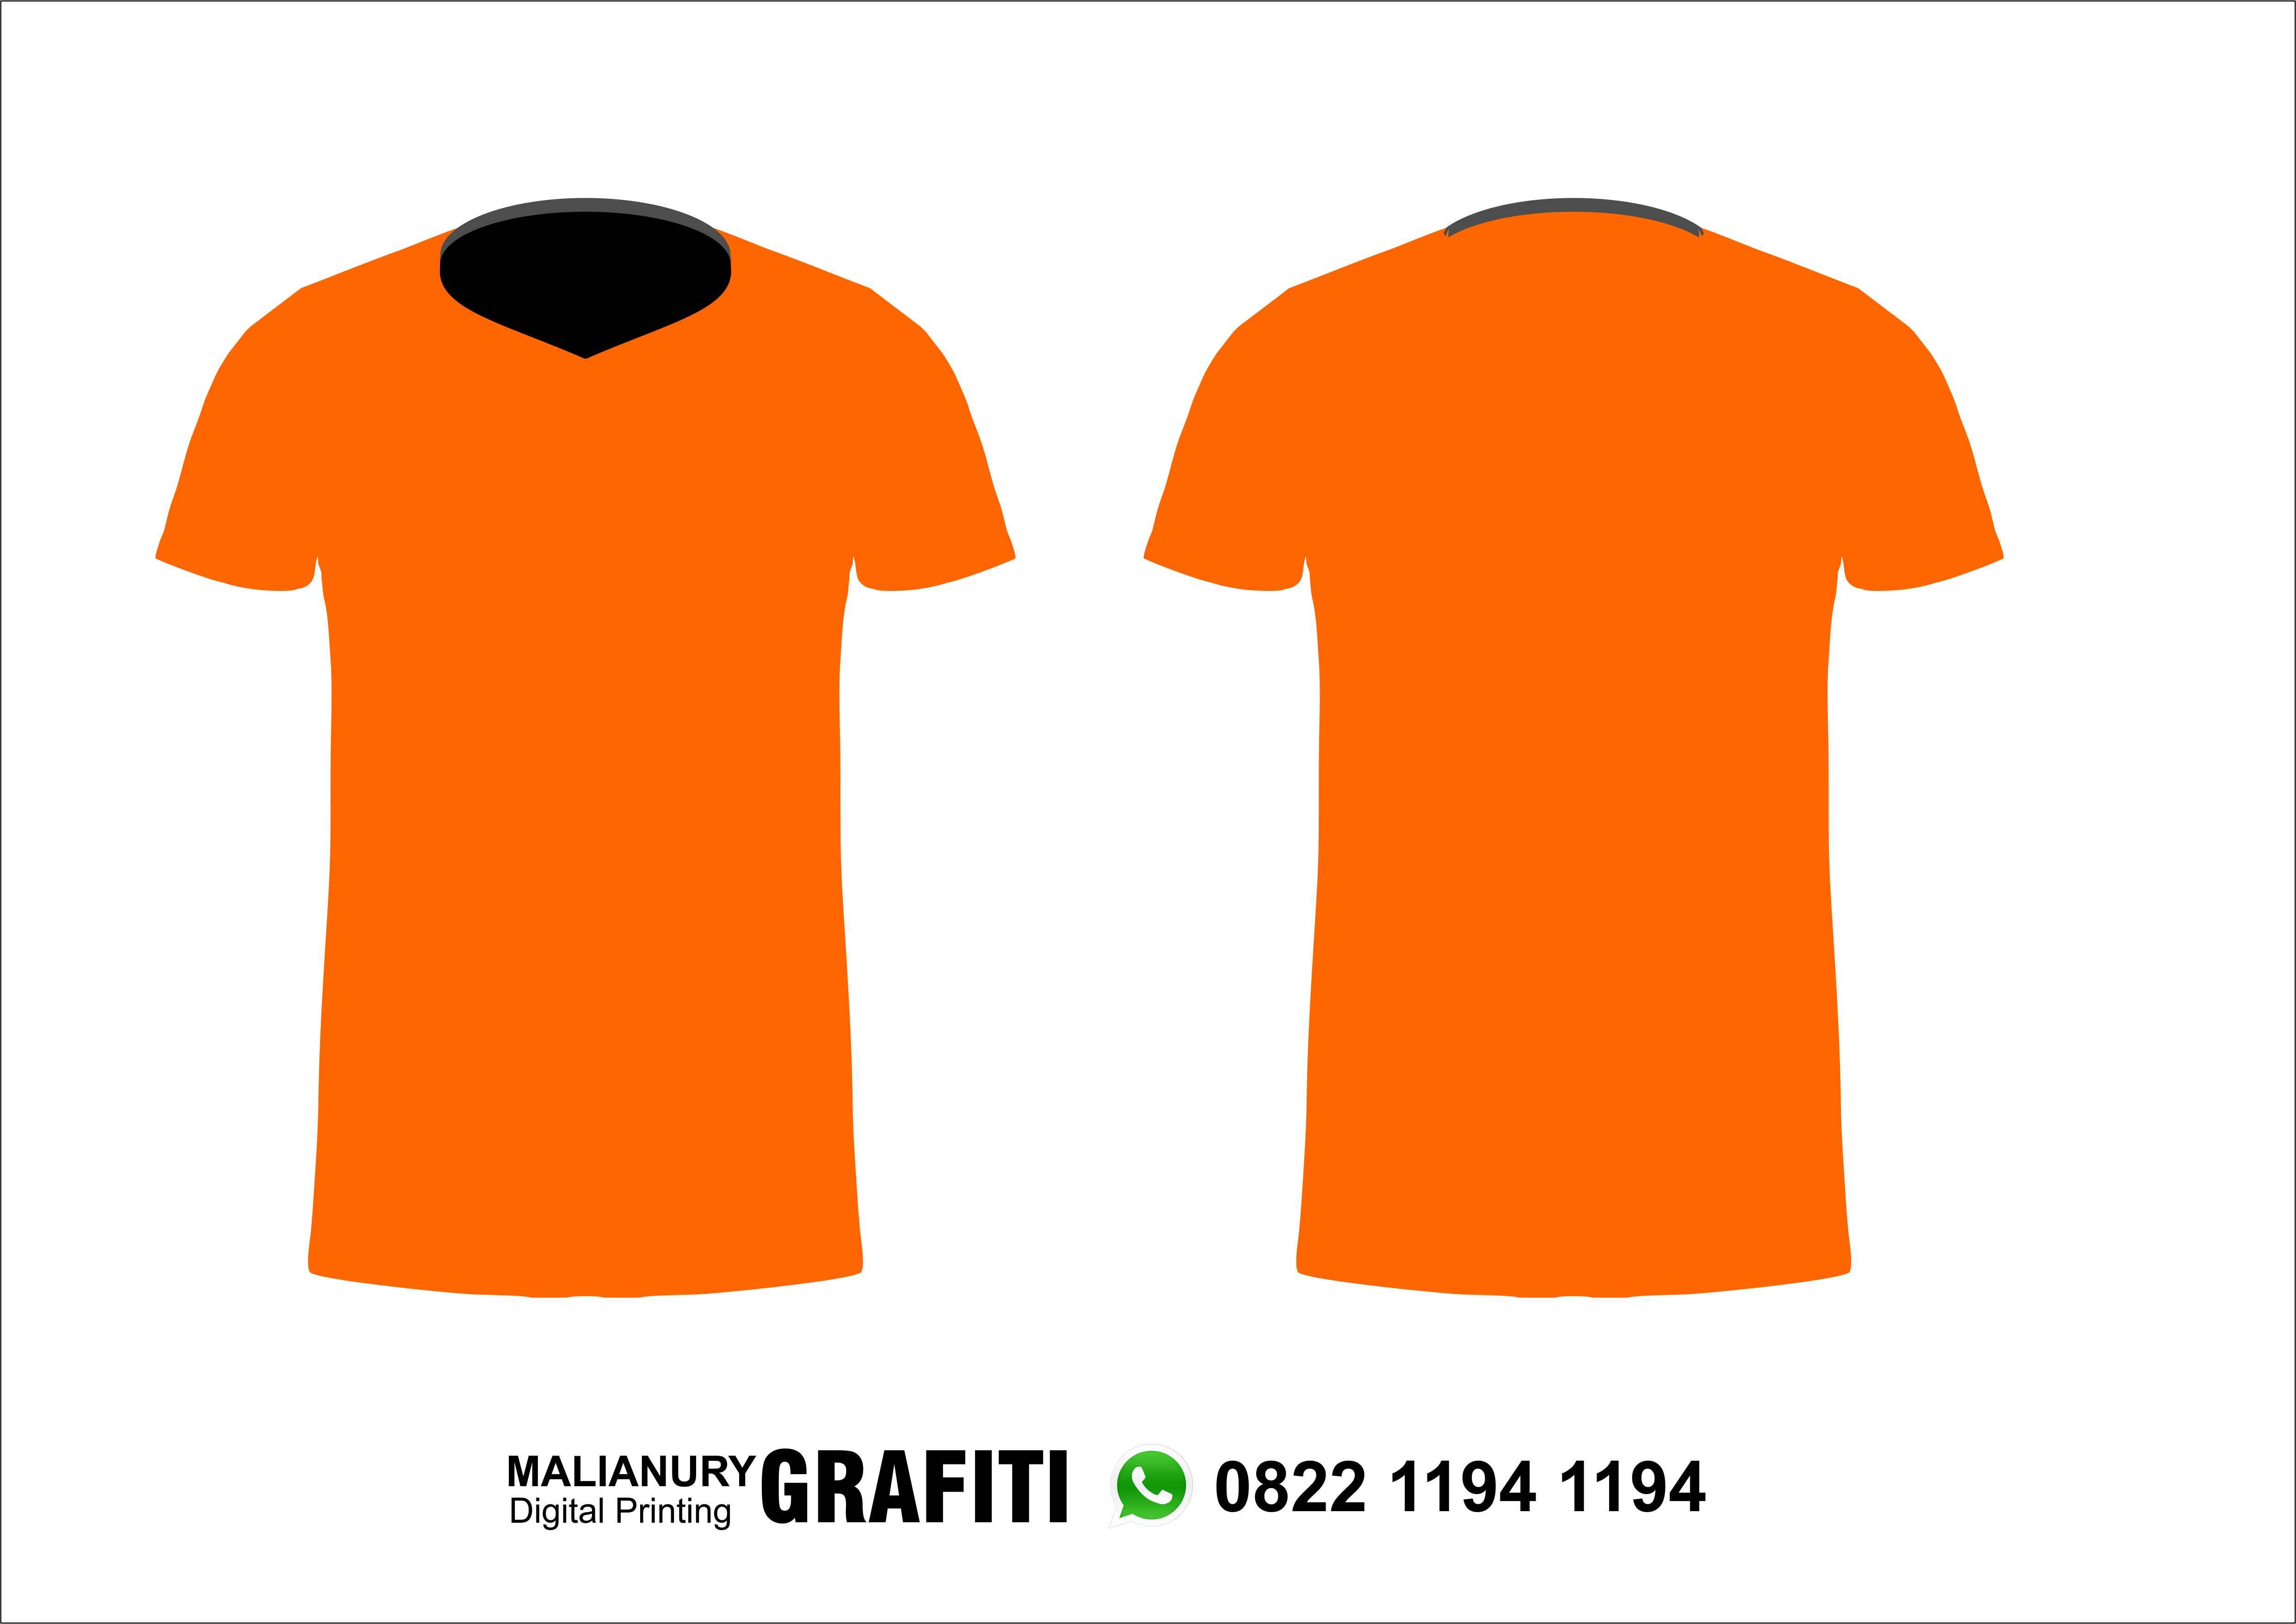 Desain Kaos T Shirt Malianury Grafiti